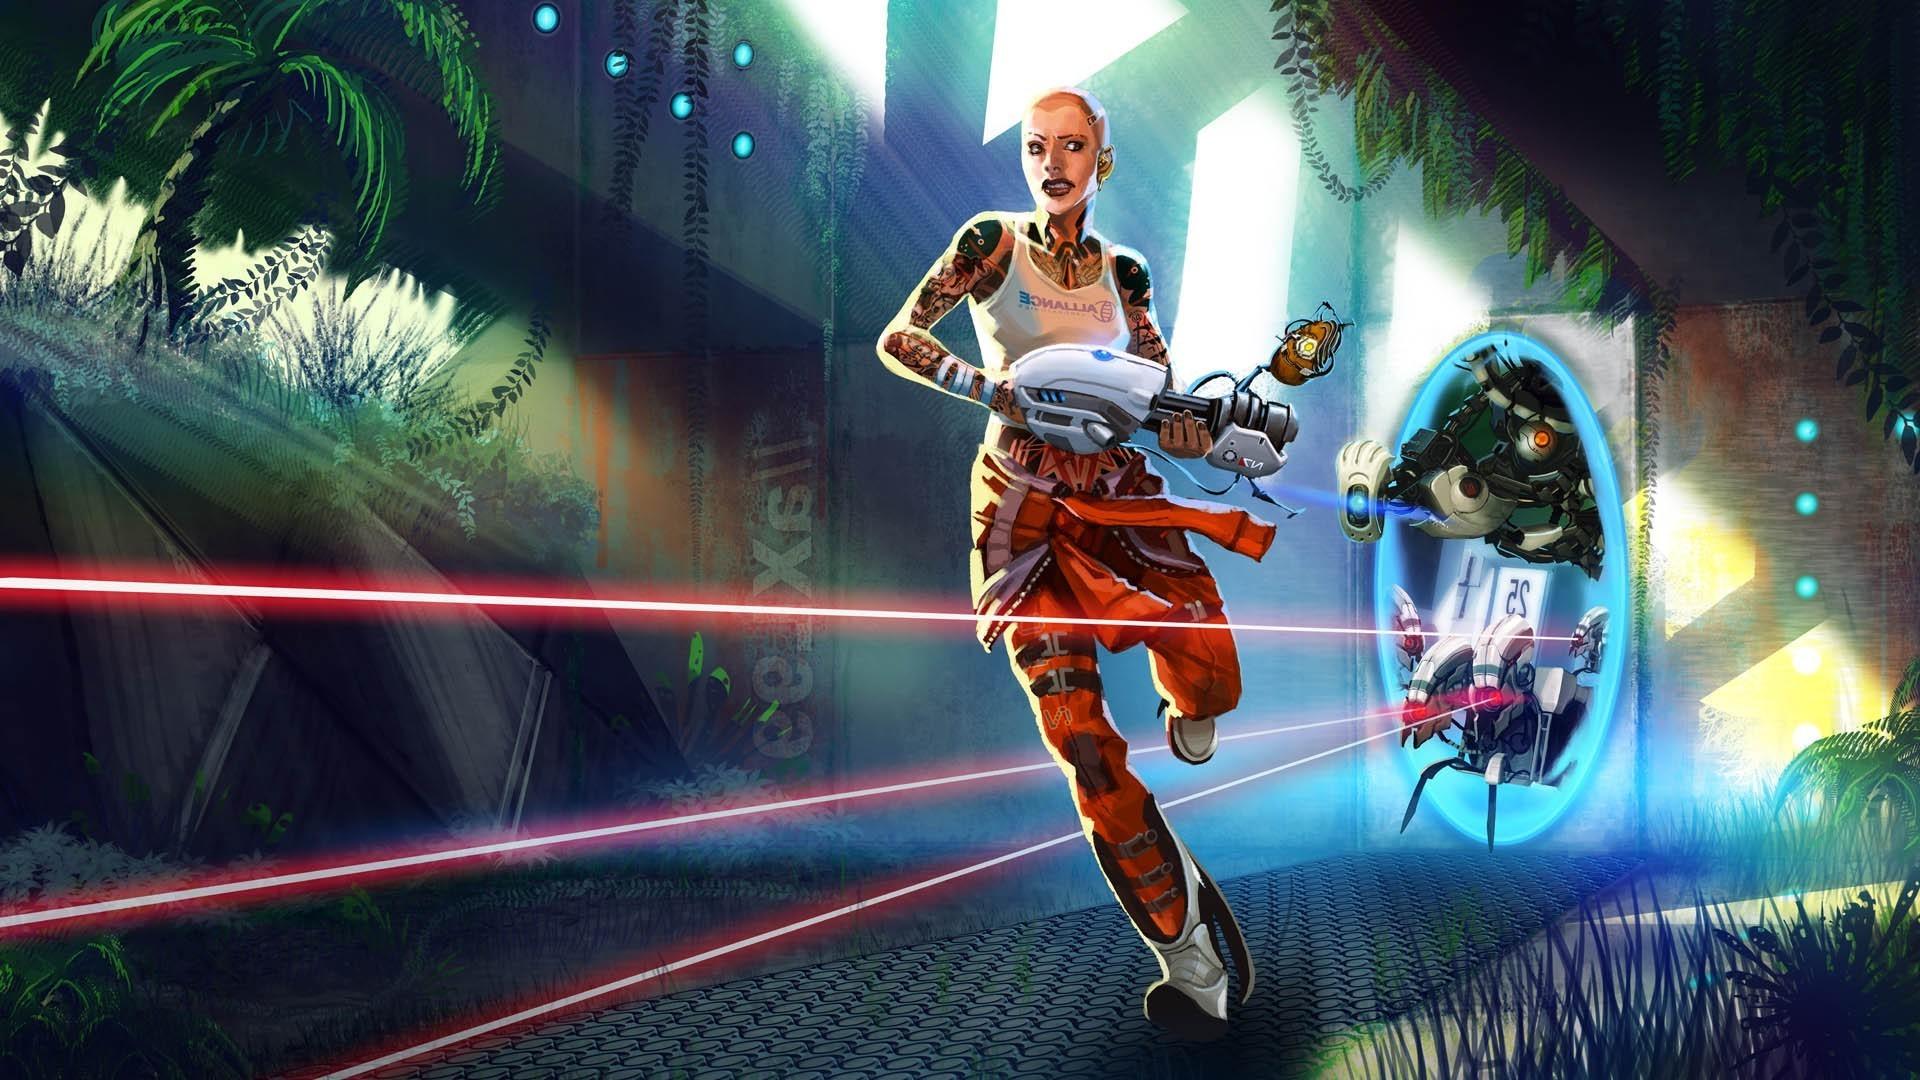 Portal 2, Valve Corporation, GLaDOS, Aperture Laboratories, Video Games,  Turrets, Mass Effect 2, Jack Wallpapers HD / Desktop and Mobile Backgrounds